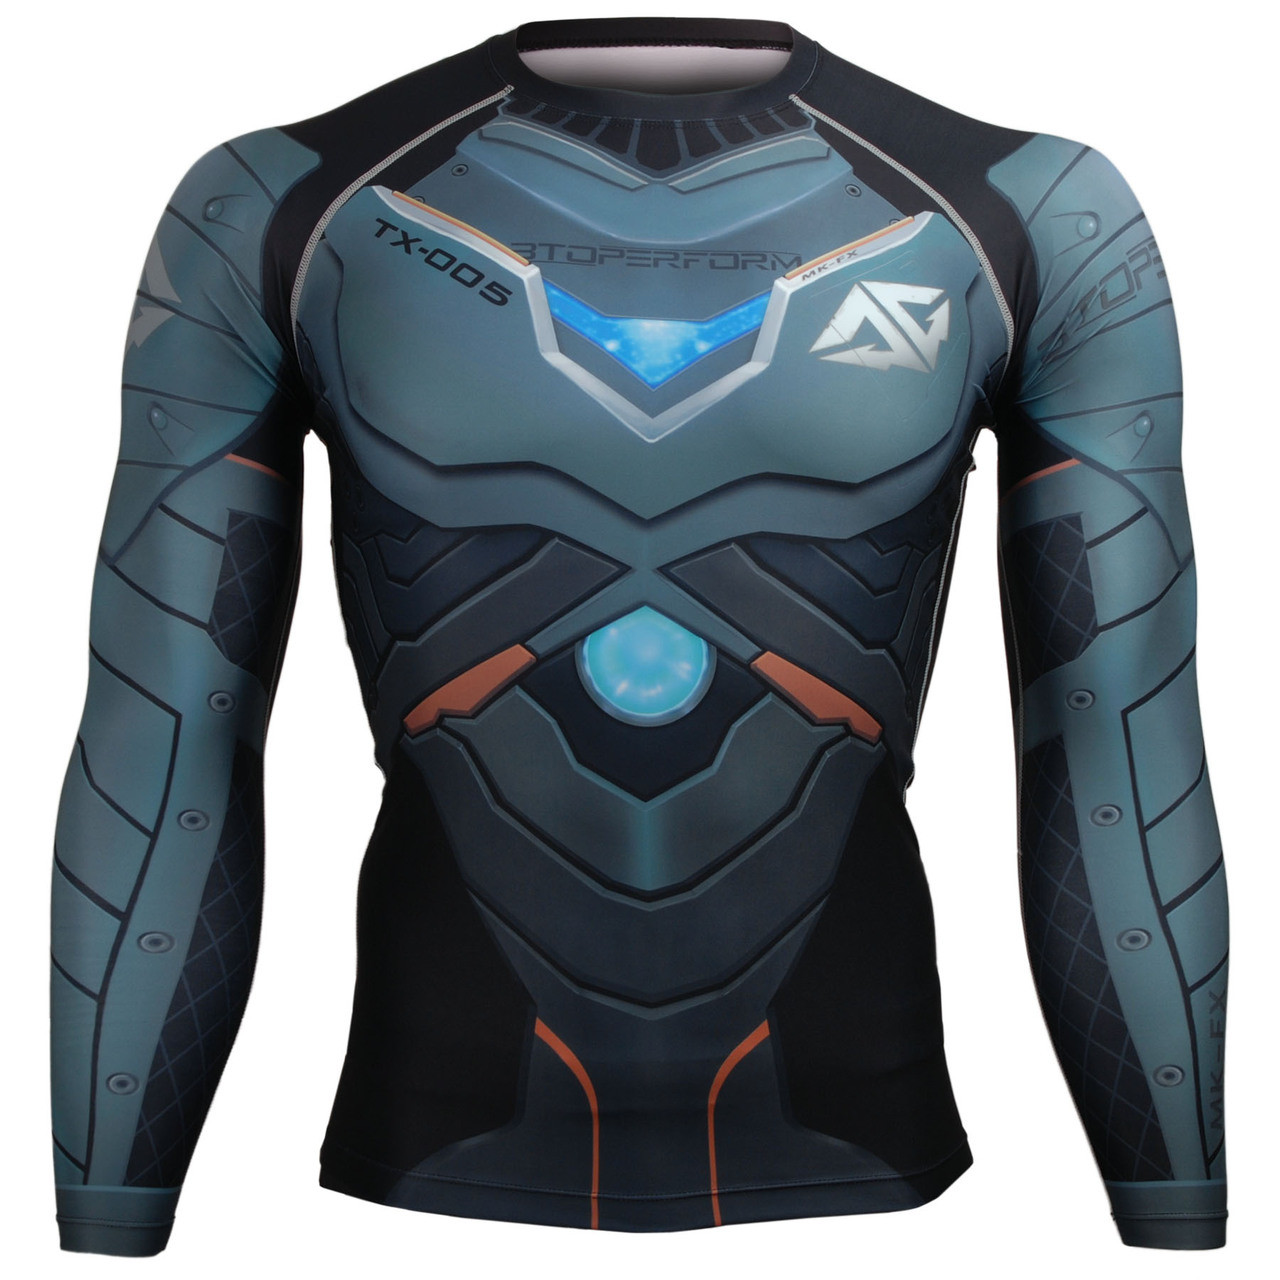 Men Compression Shirt Full Sleeves Base Layer Skin Tight Activewear Rash Guard